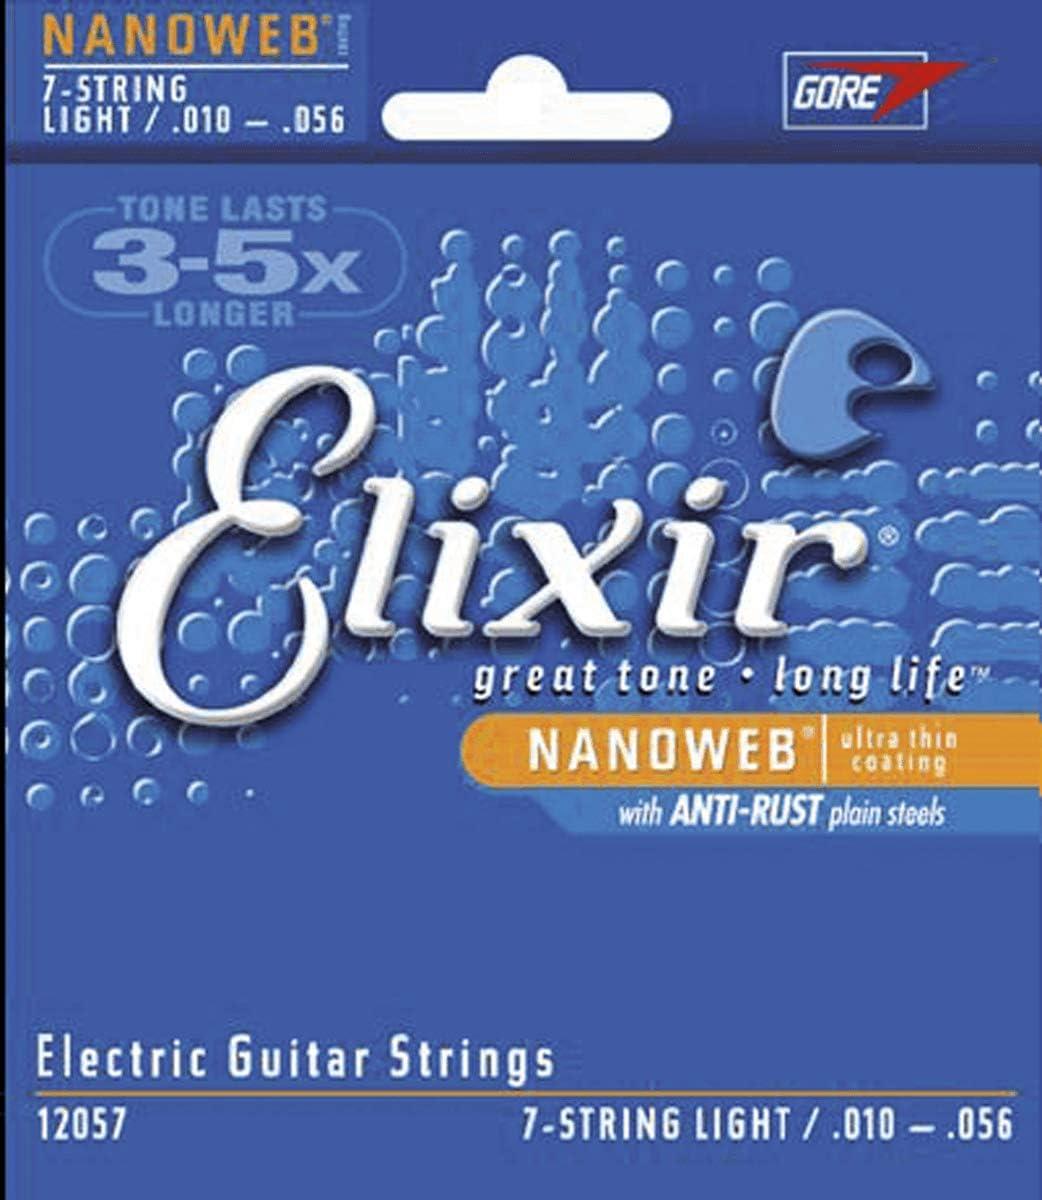 Elixir 12057 - Juego de cuerdas para guitarra eléctrica, .010 - 0.056